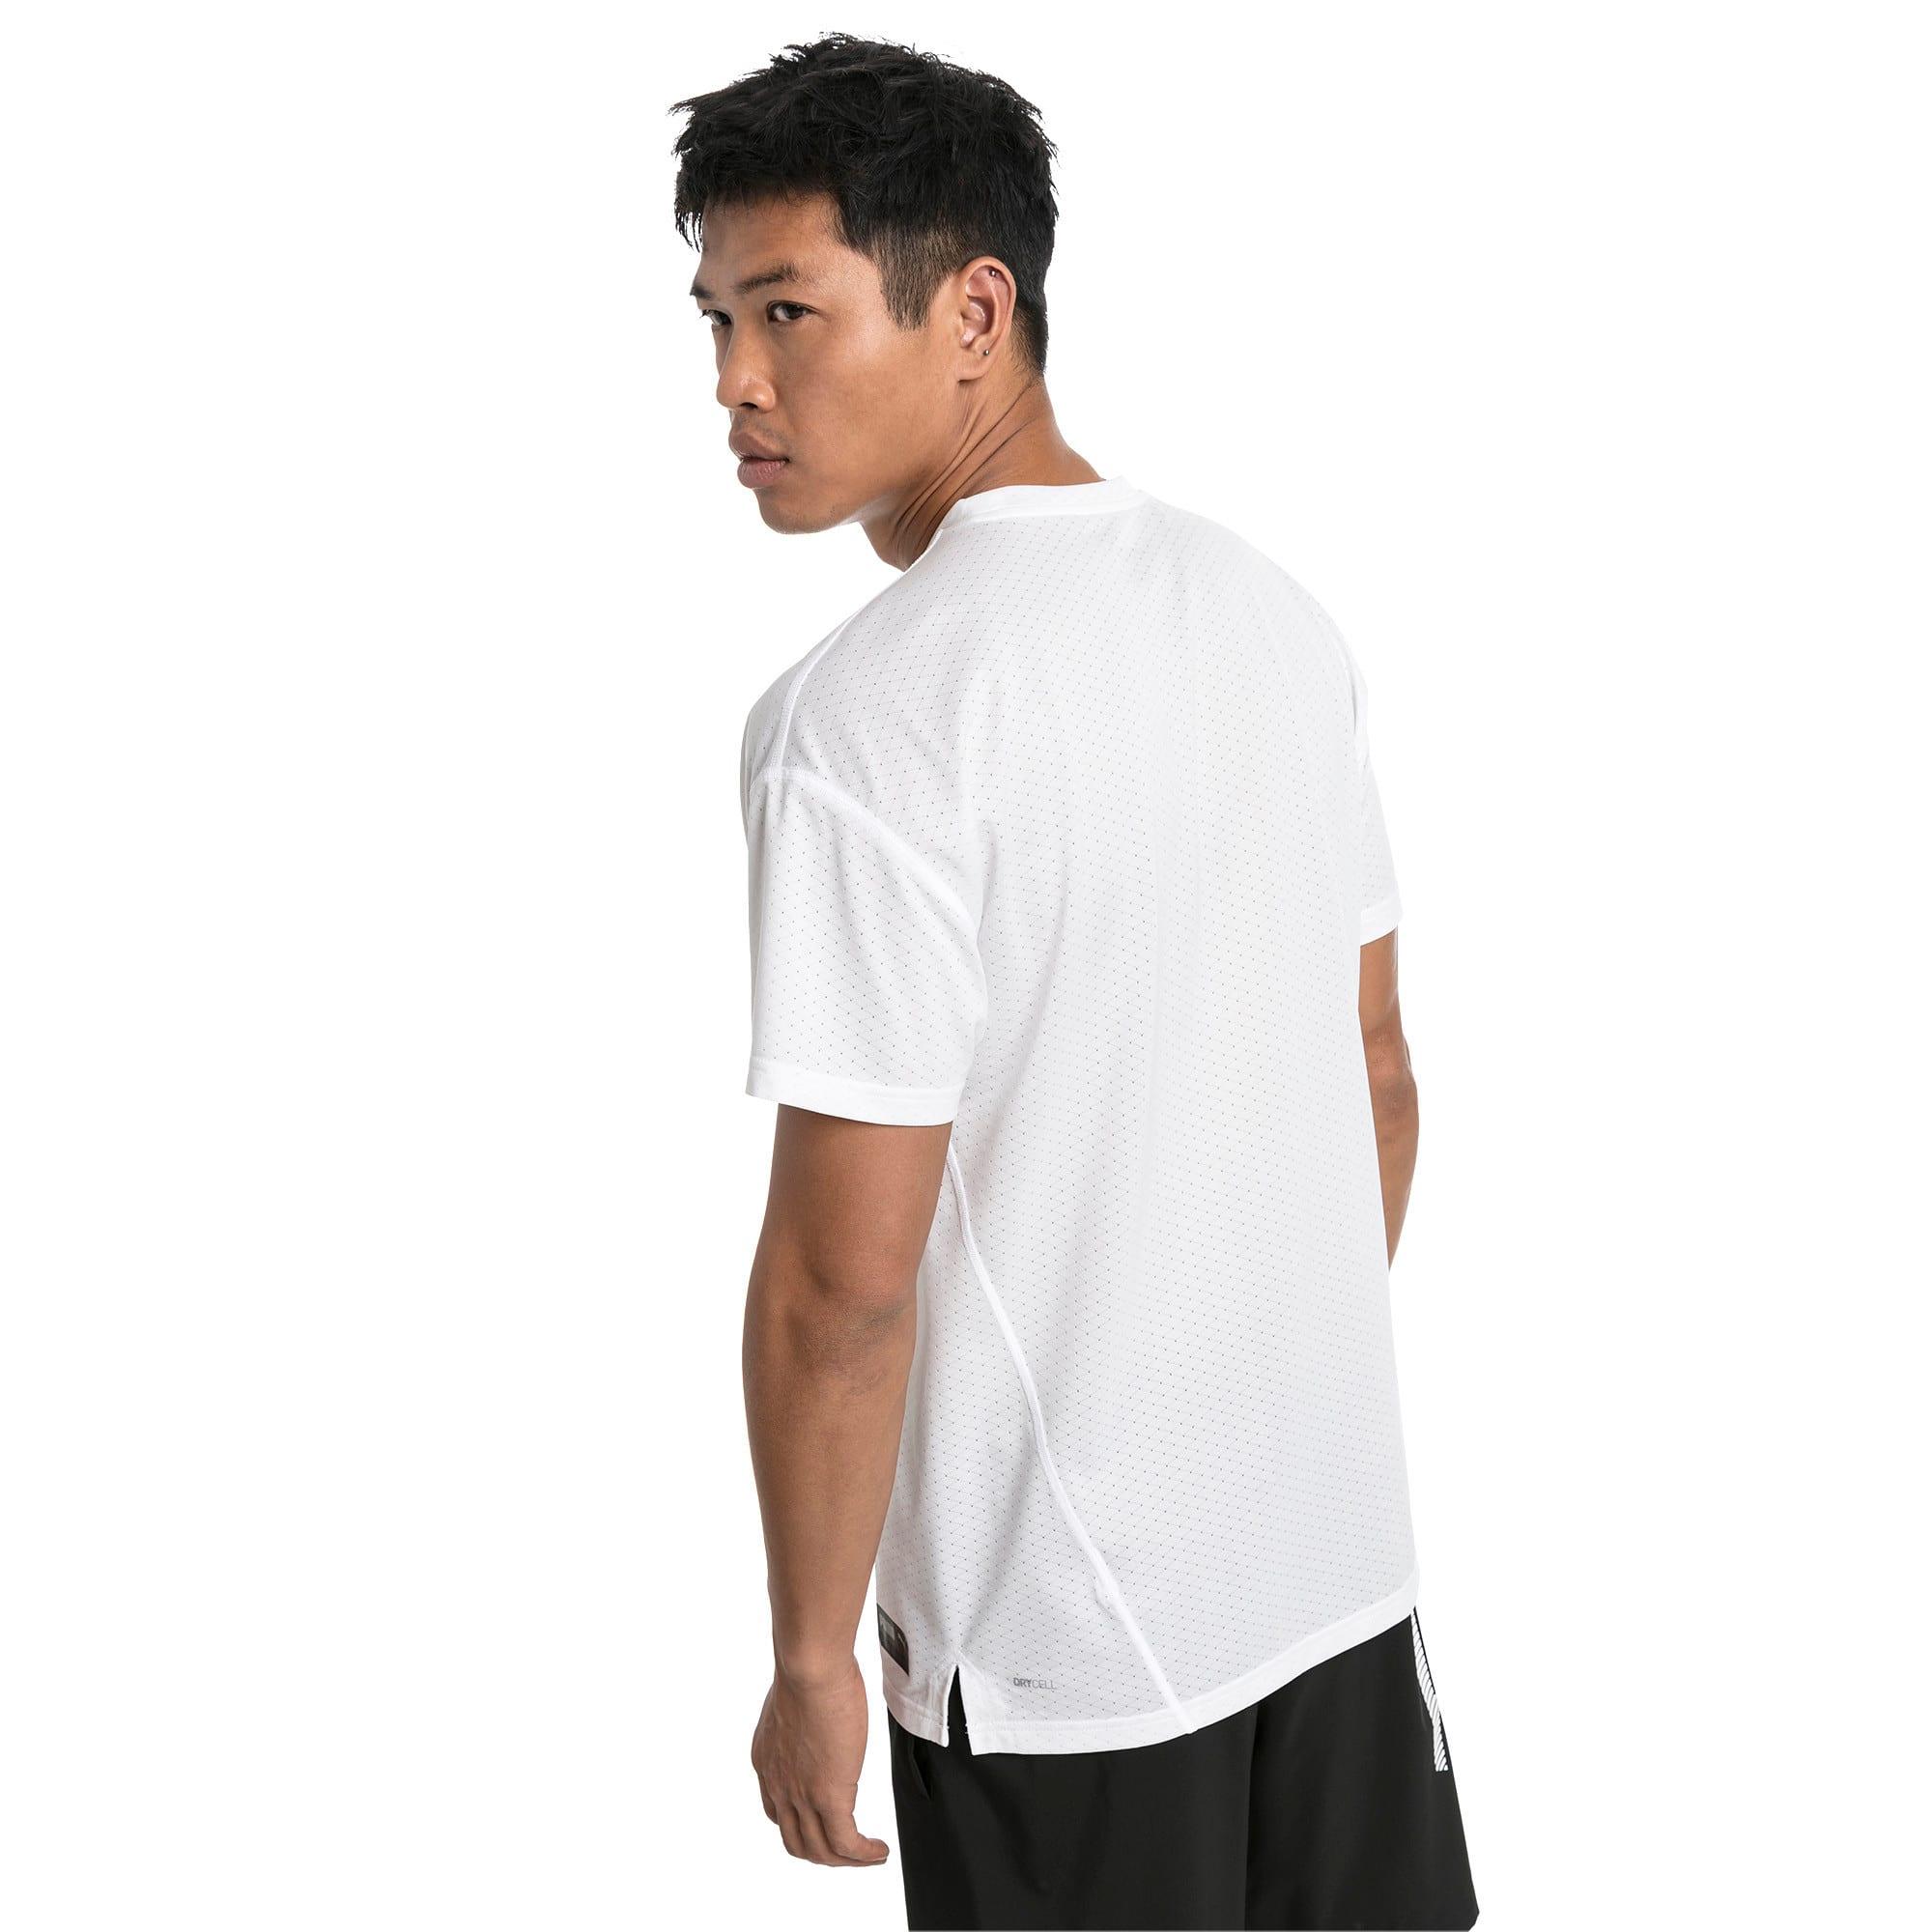 Thumbnail 2 of A.C.E. Short Sleeve Men's Training Top, Puma White, medium